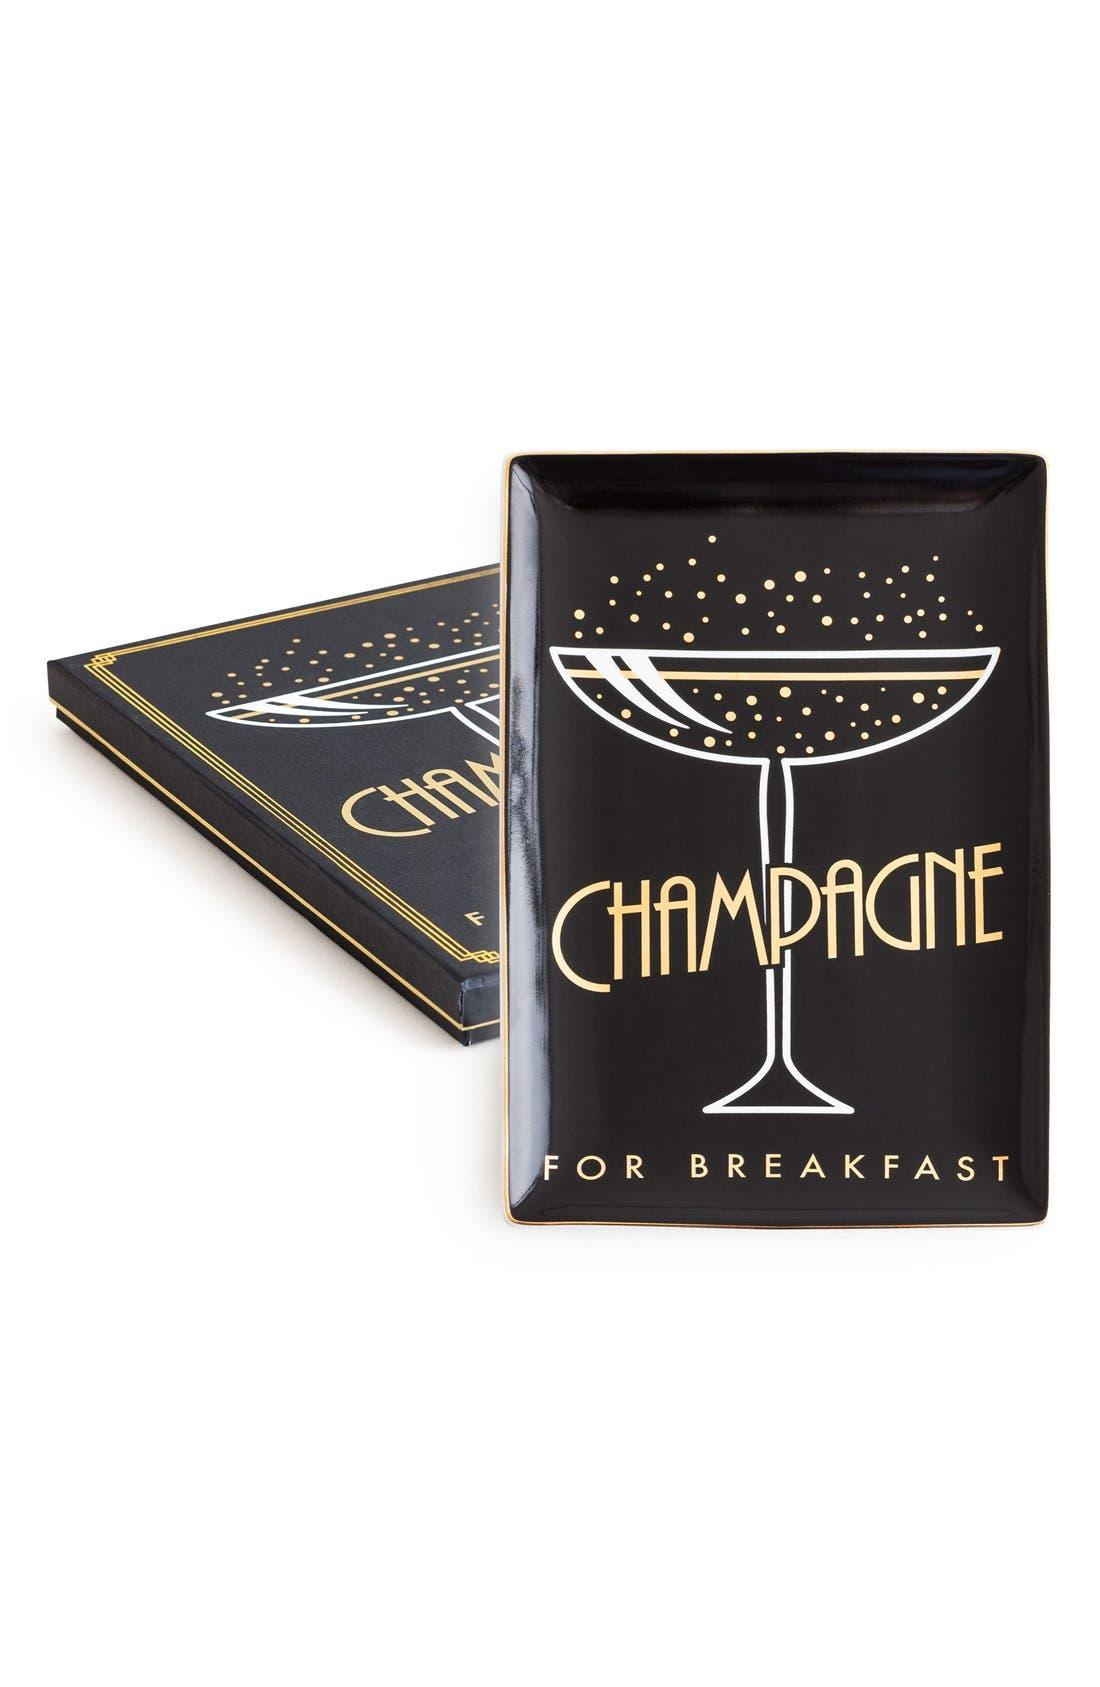 Champagne for Breakfast Porcelain Trinket Tray,                         Main,                         color, 001